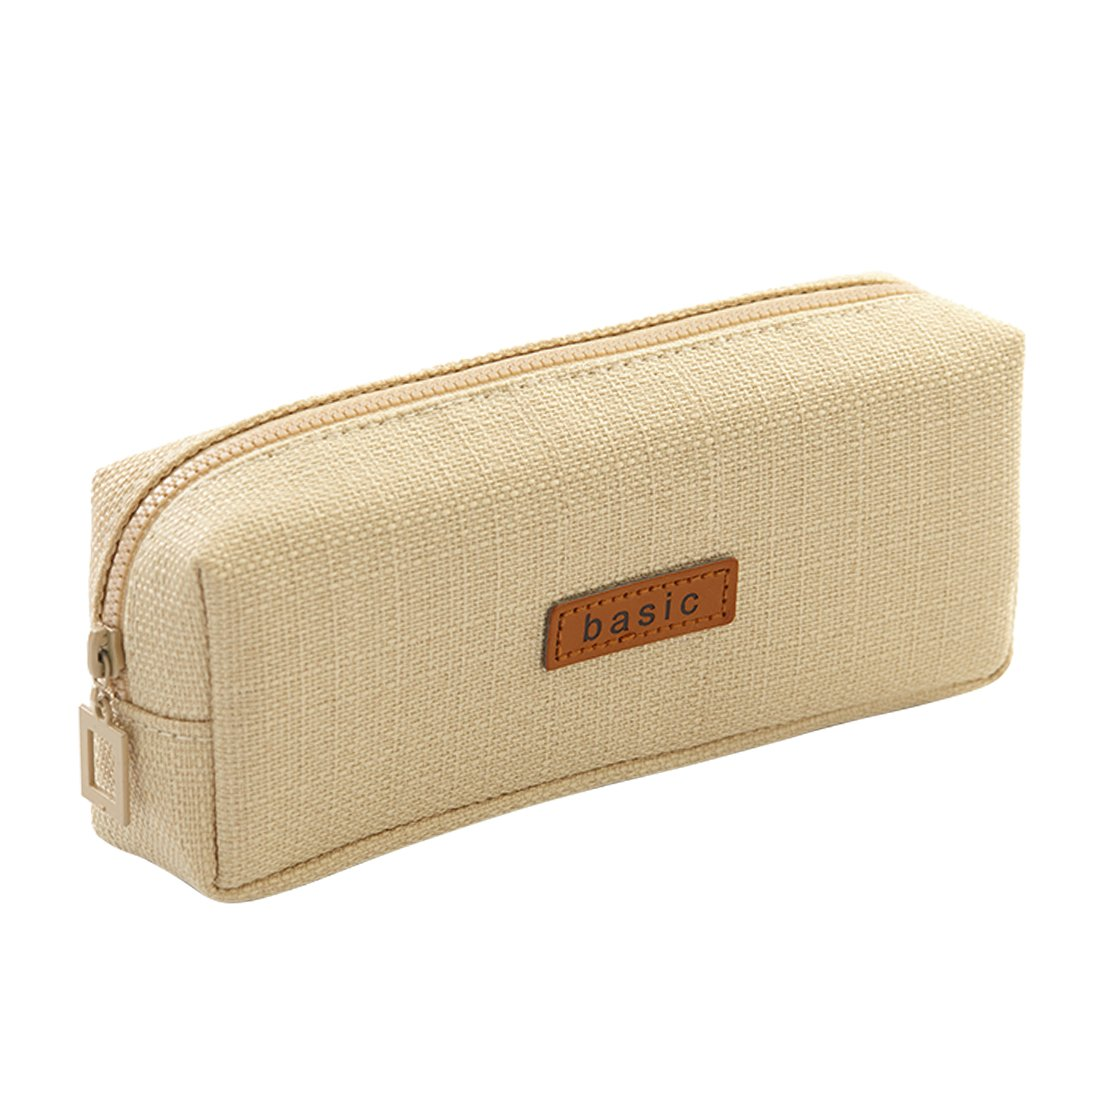 Avengers Zippered PouchPencil CaseMakeup BagSmall Project Bag